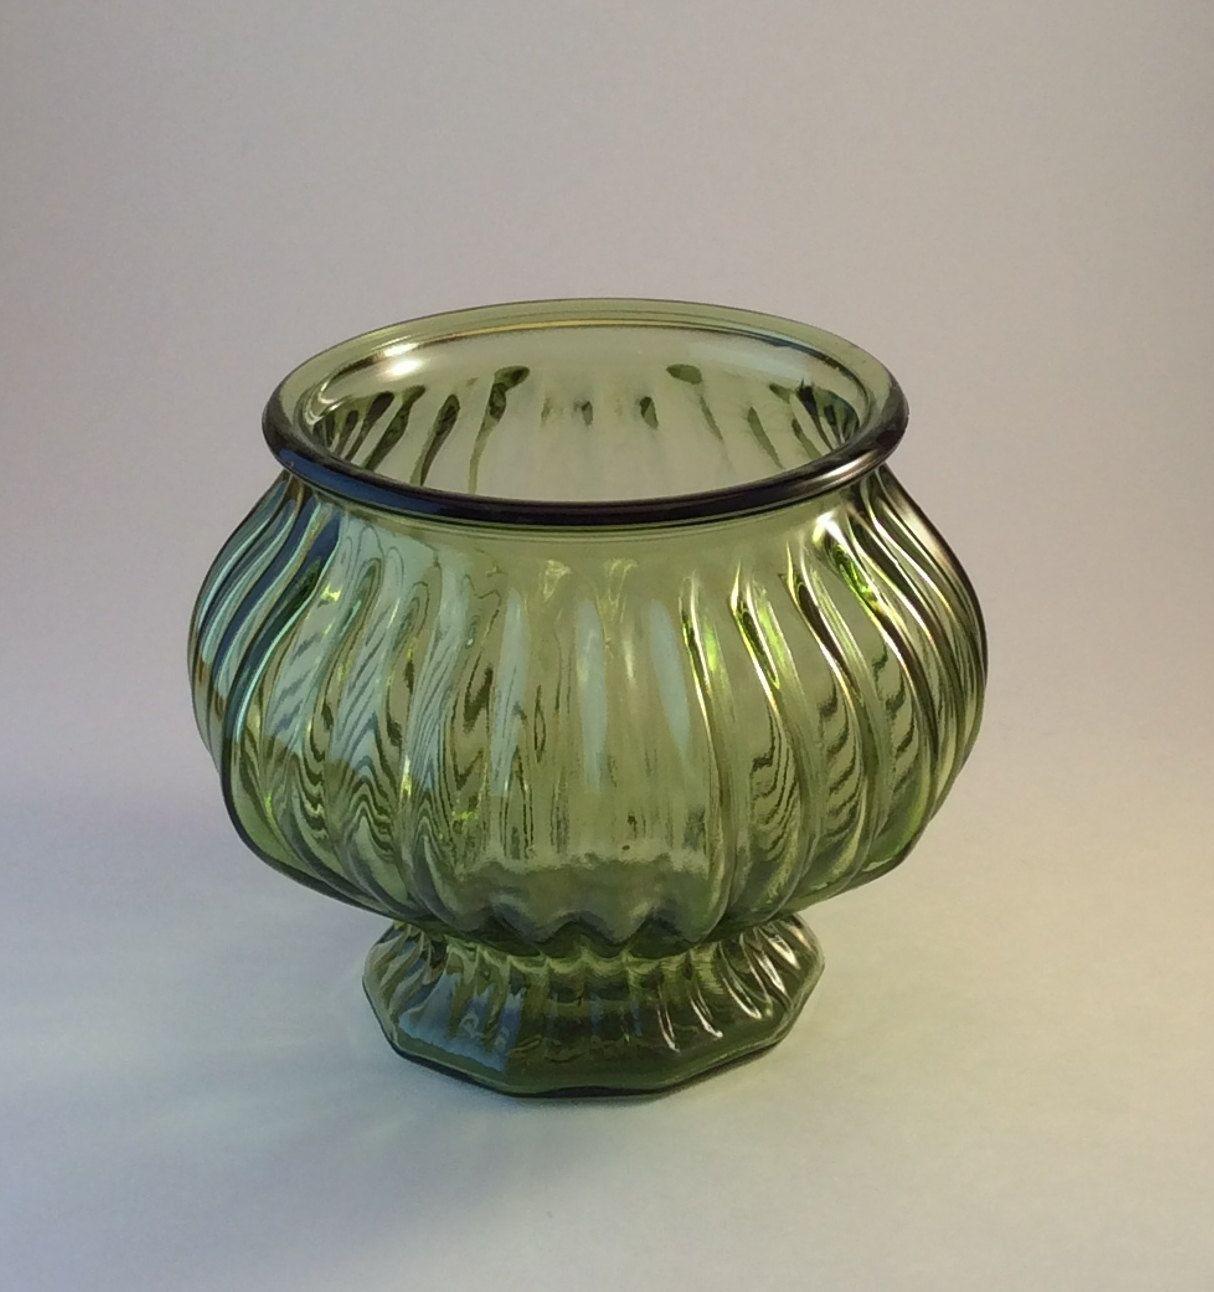 Vintage eo brody olive green glass planter e o brody green brody olive green glass planter e brody green glass planter green glass planter vase by on etsy reviewsmspy